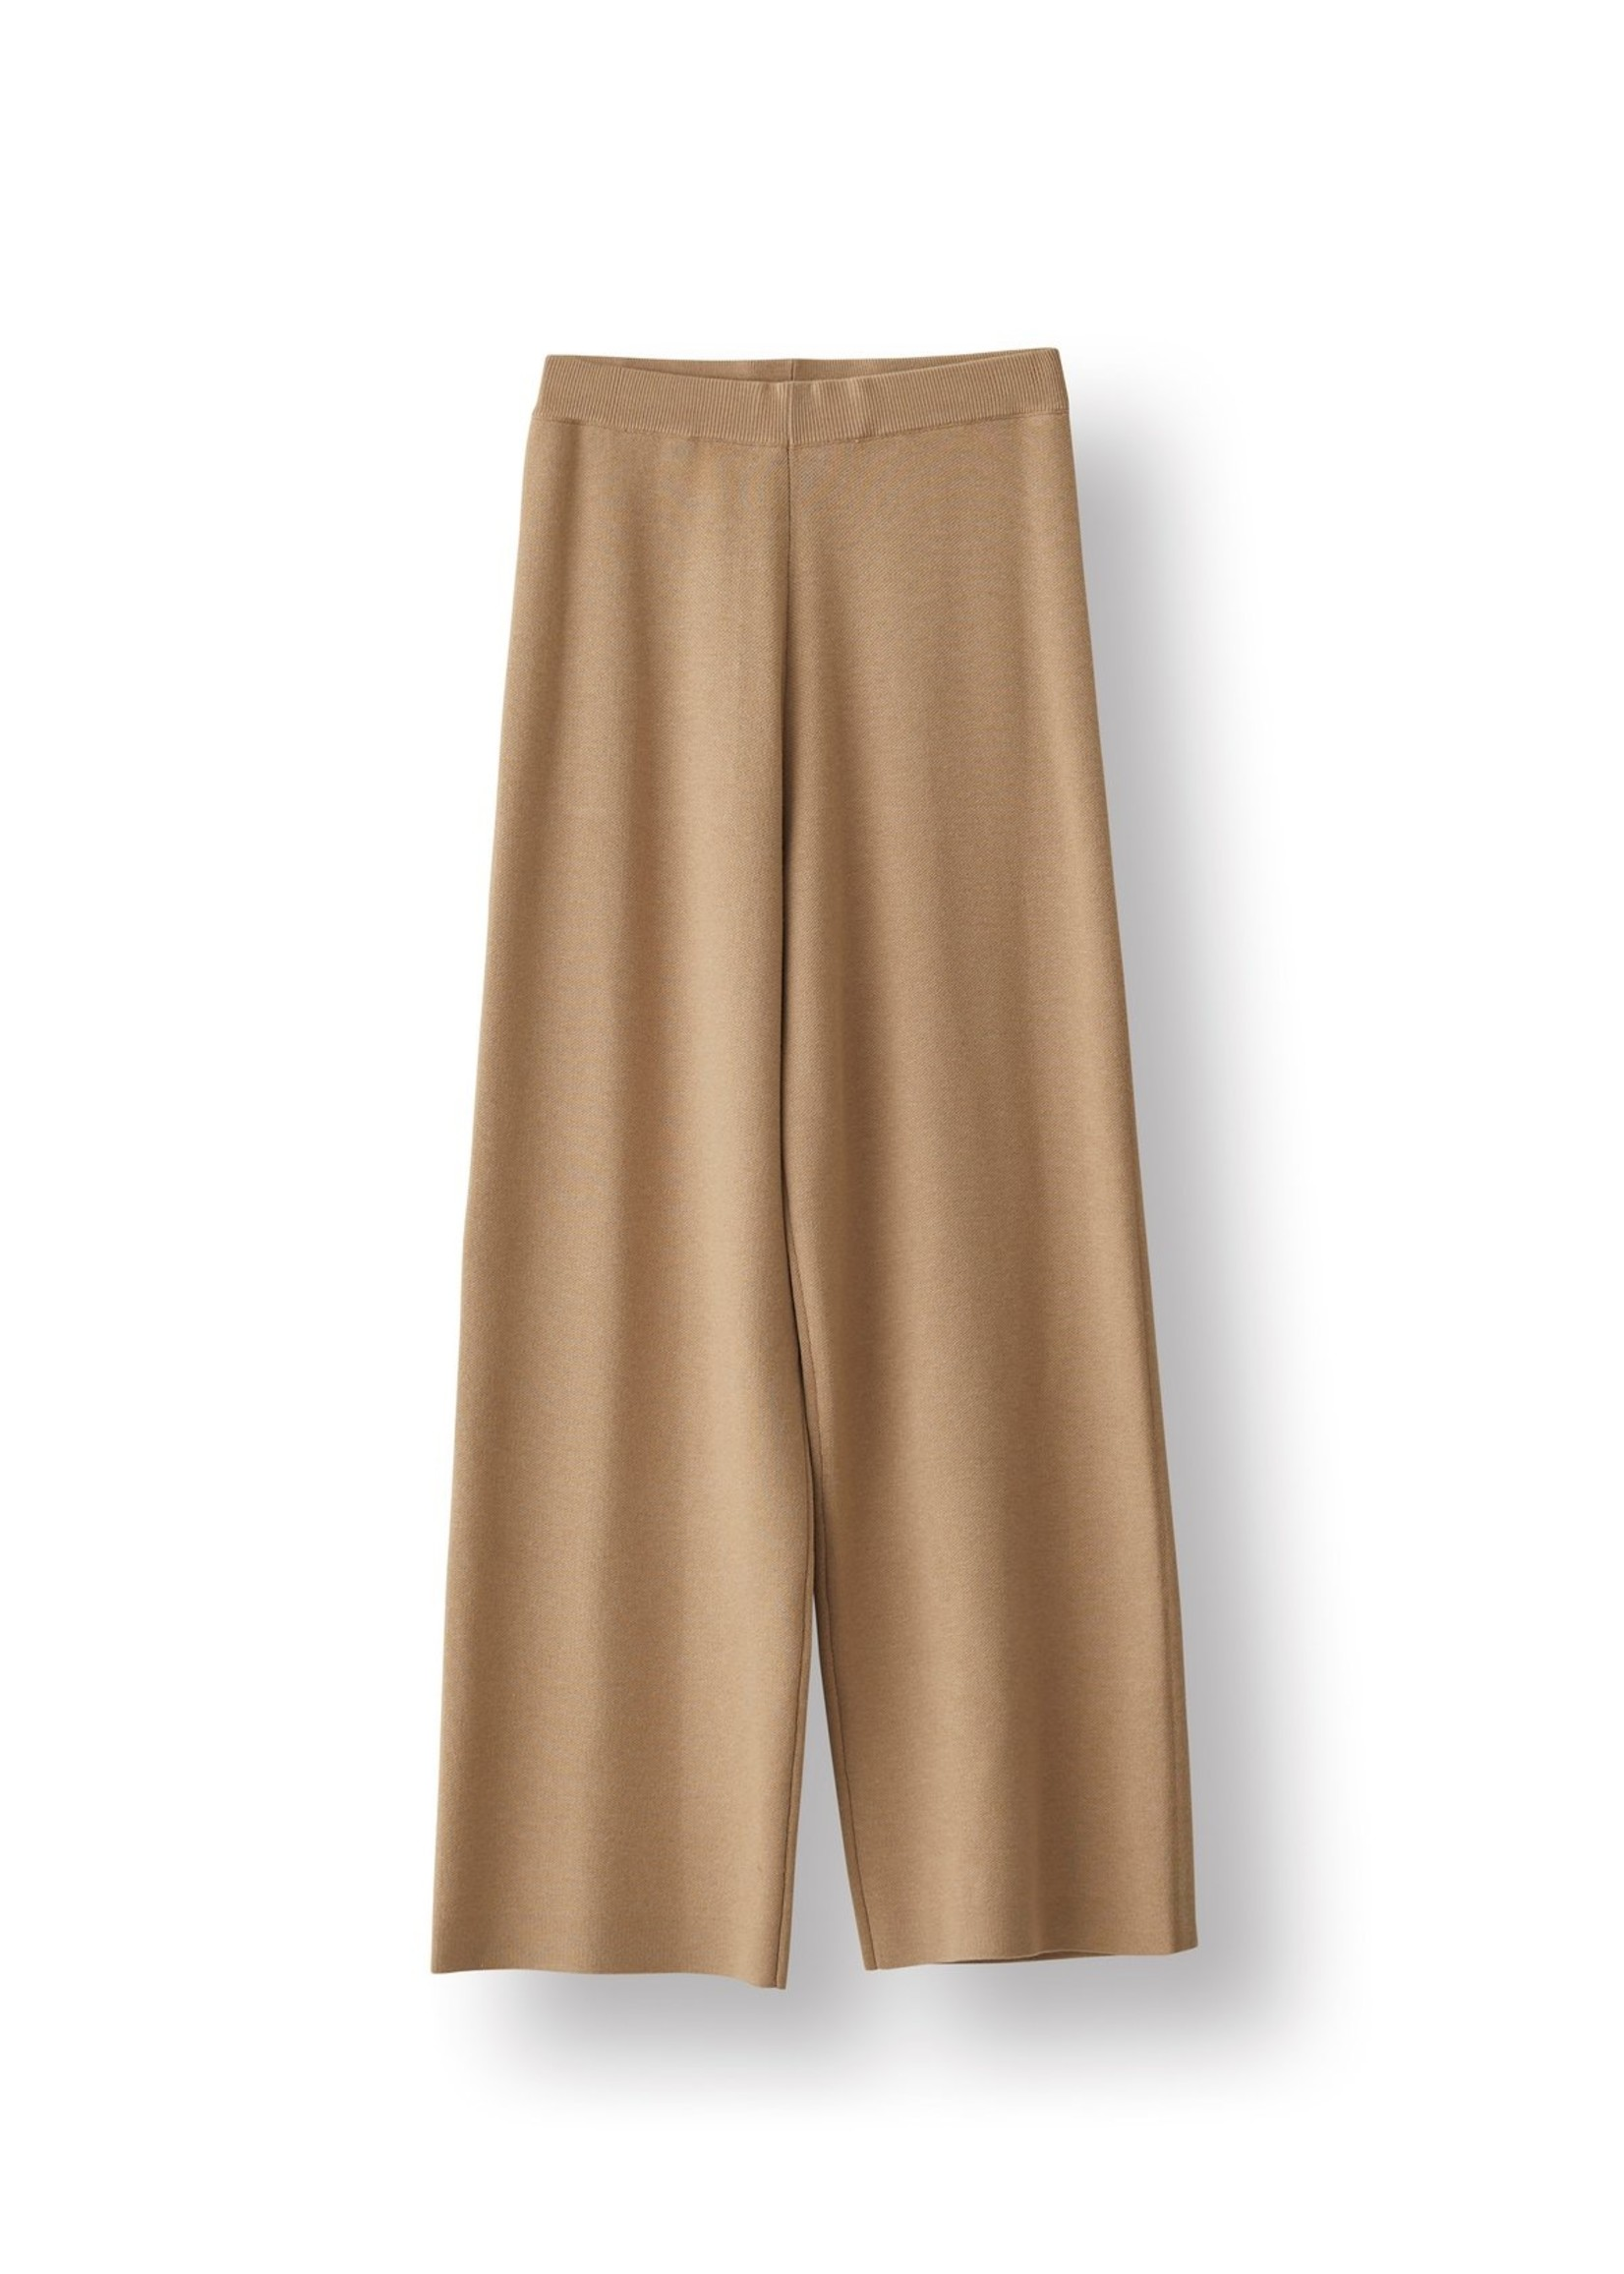 NORR Als Pocket Knit Pants